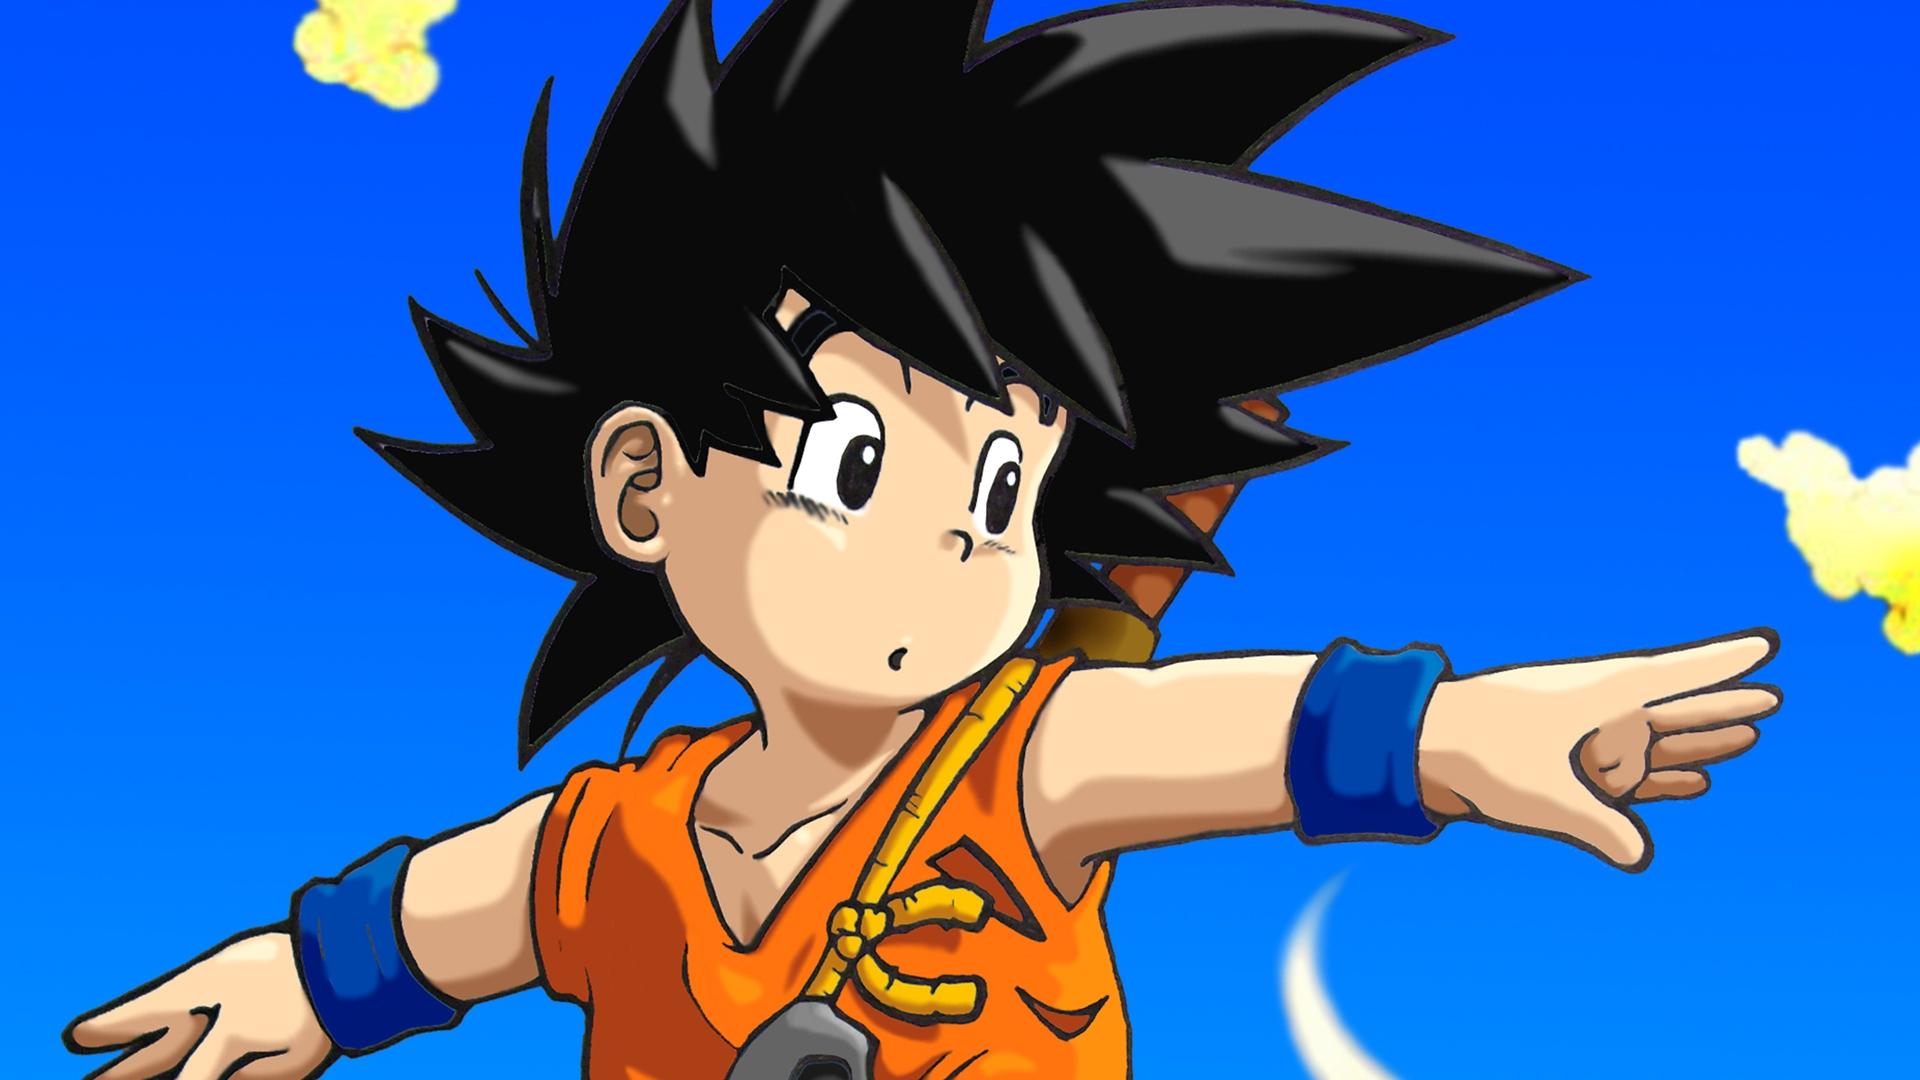 Son Goku wallpapers HD   396917 1920x1080